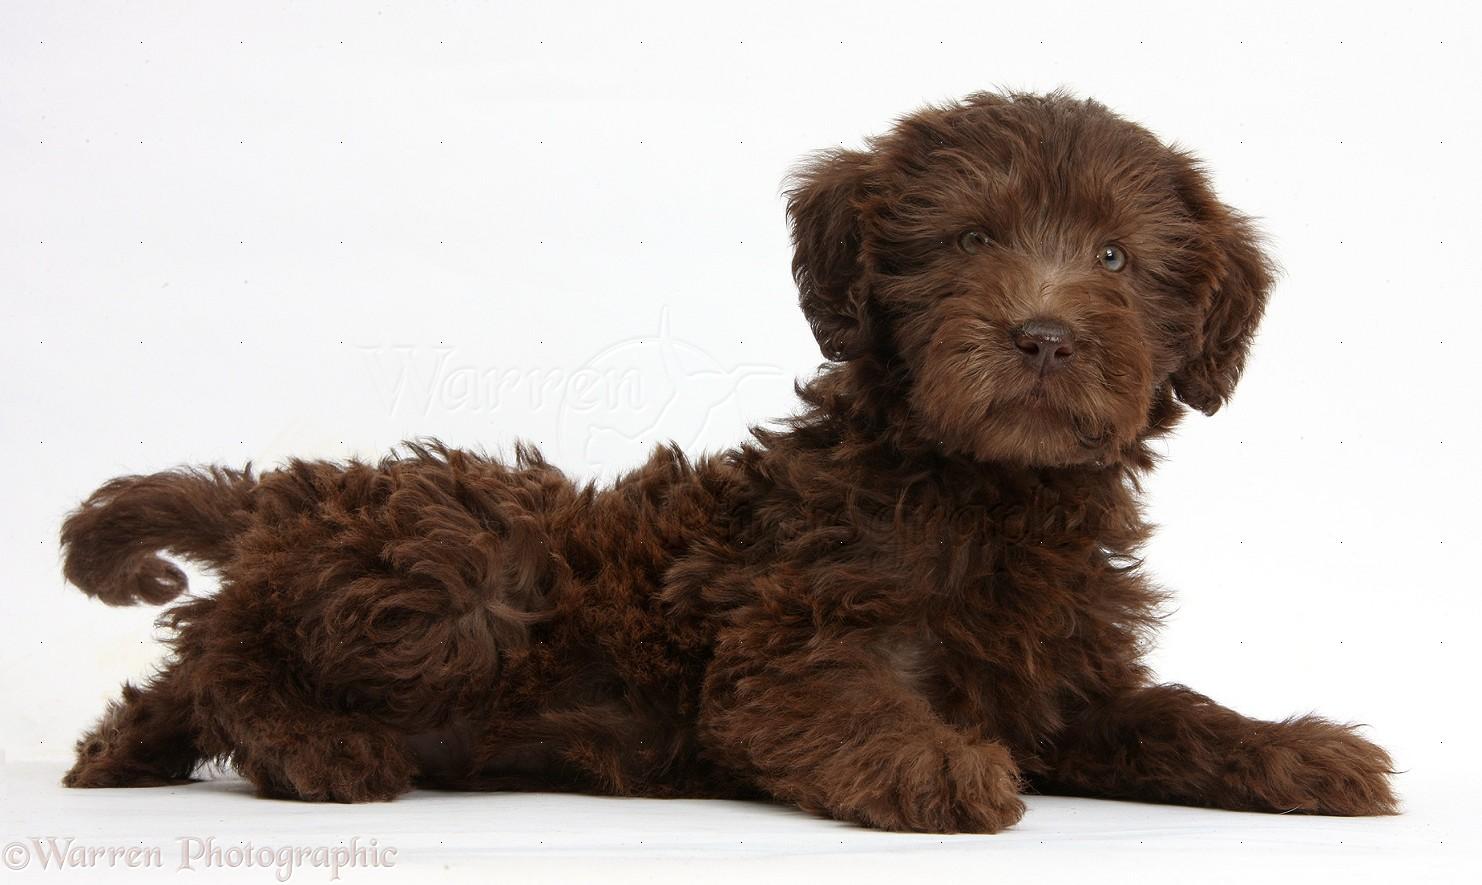 Dog: Chocolate Labradoodle puppy photo - WP39283